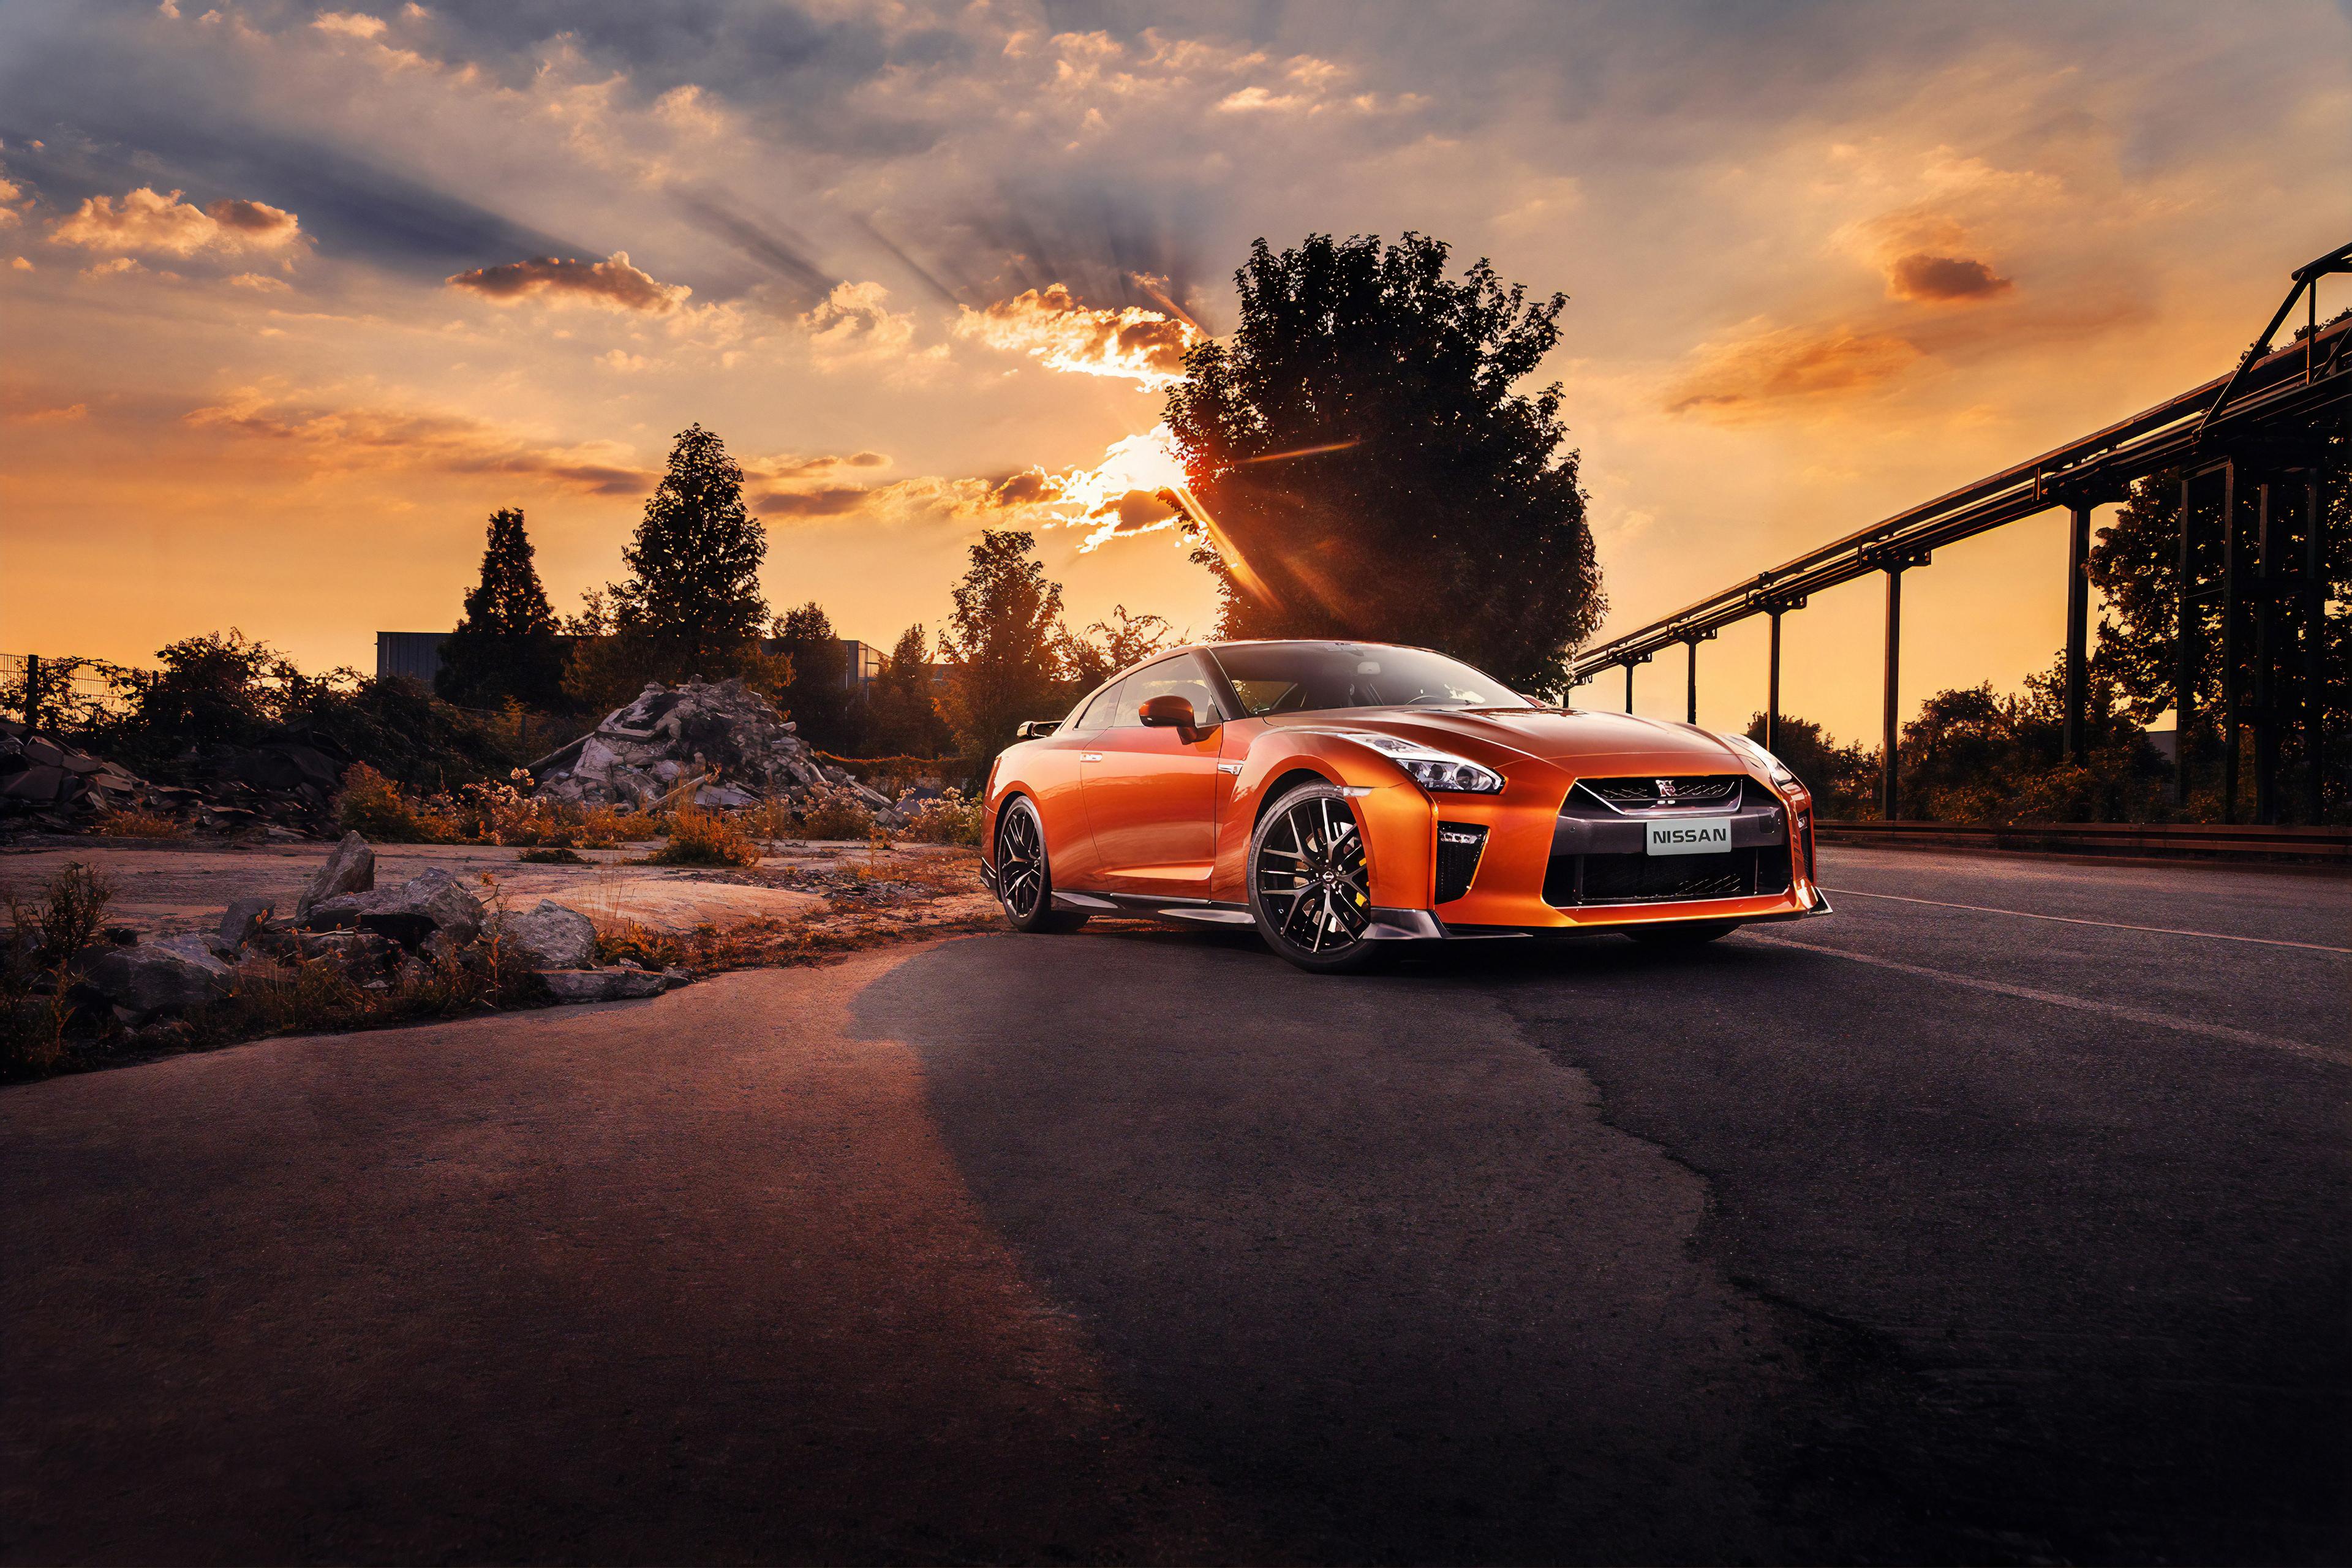 Orange Nissan GTR, HD Cars, 4k Wallpapers, Images ...